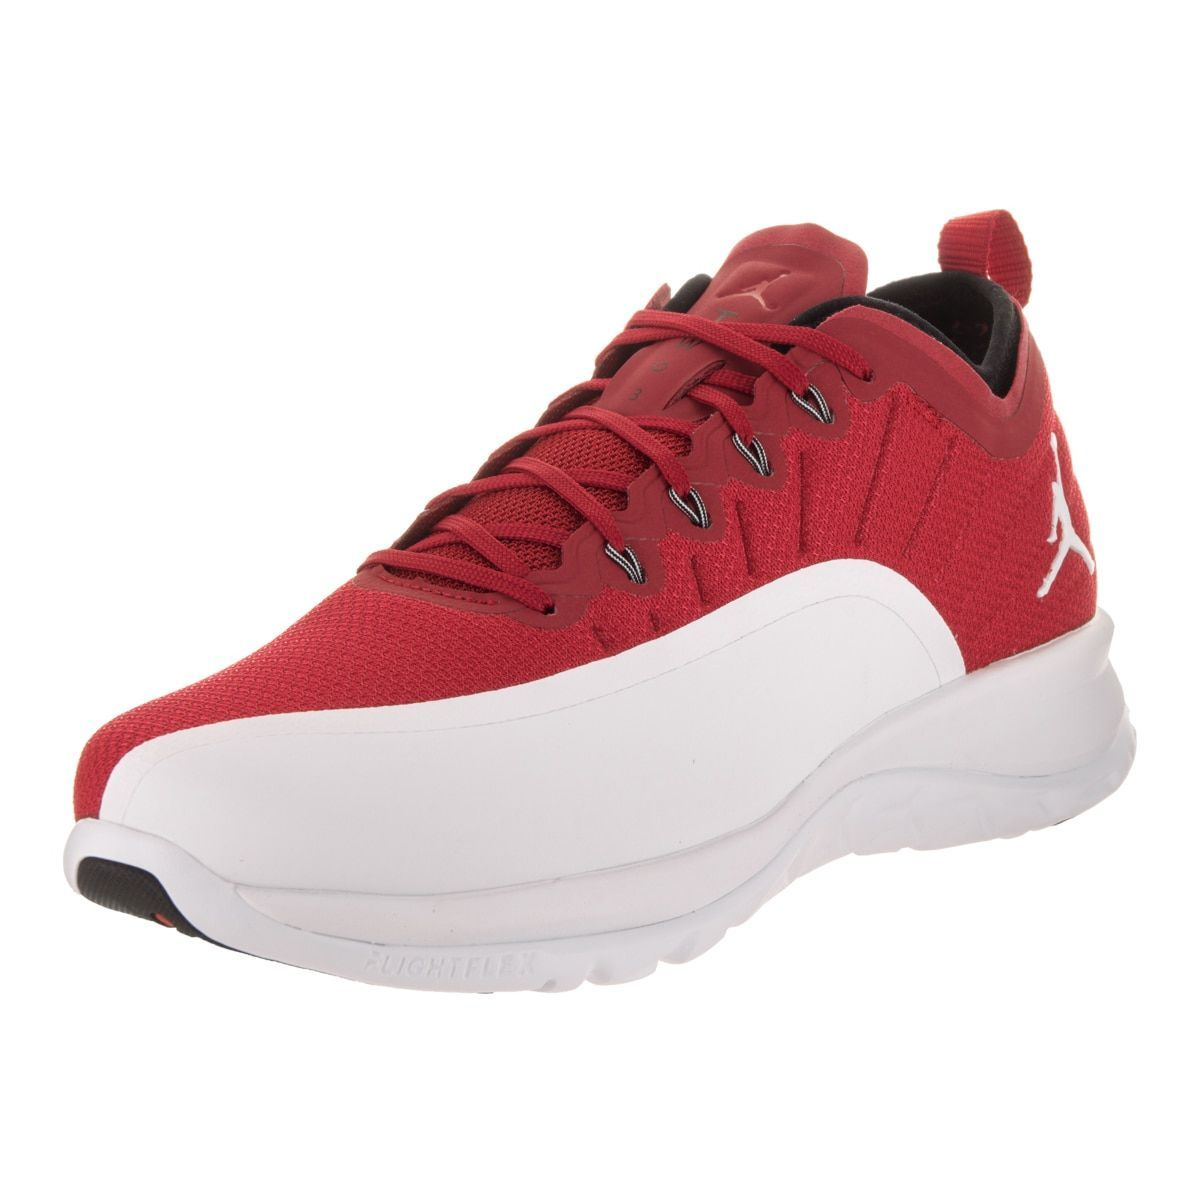 jordans training shoes for men